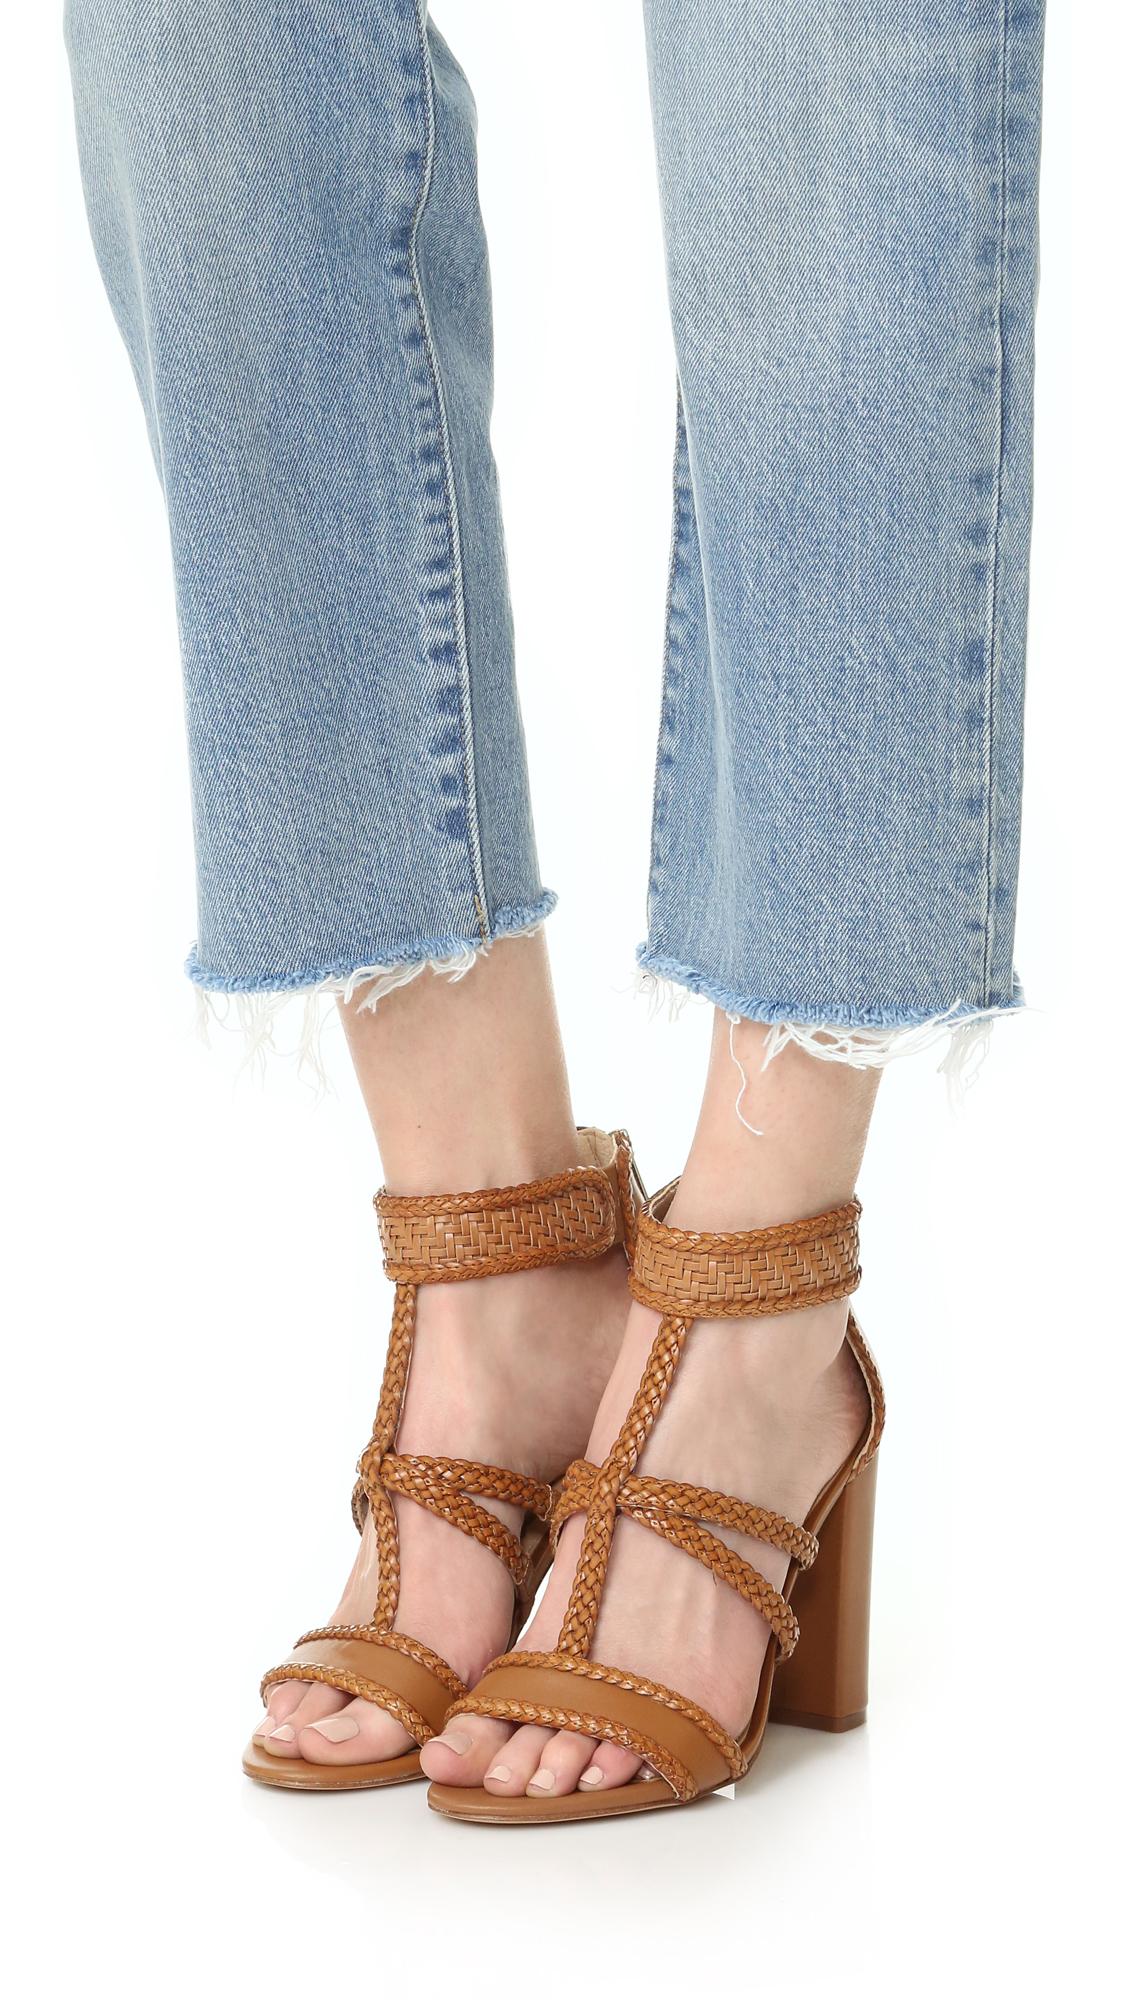 a97808238274f Sam Edelman Yordana Woven Leather Sandals